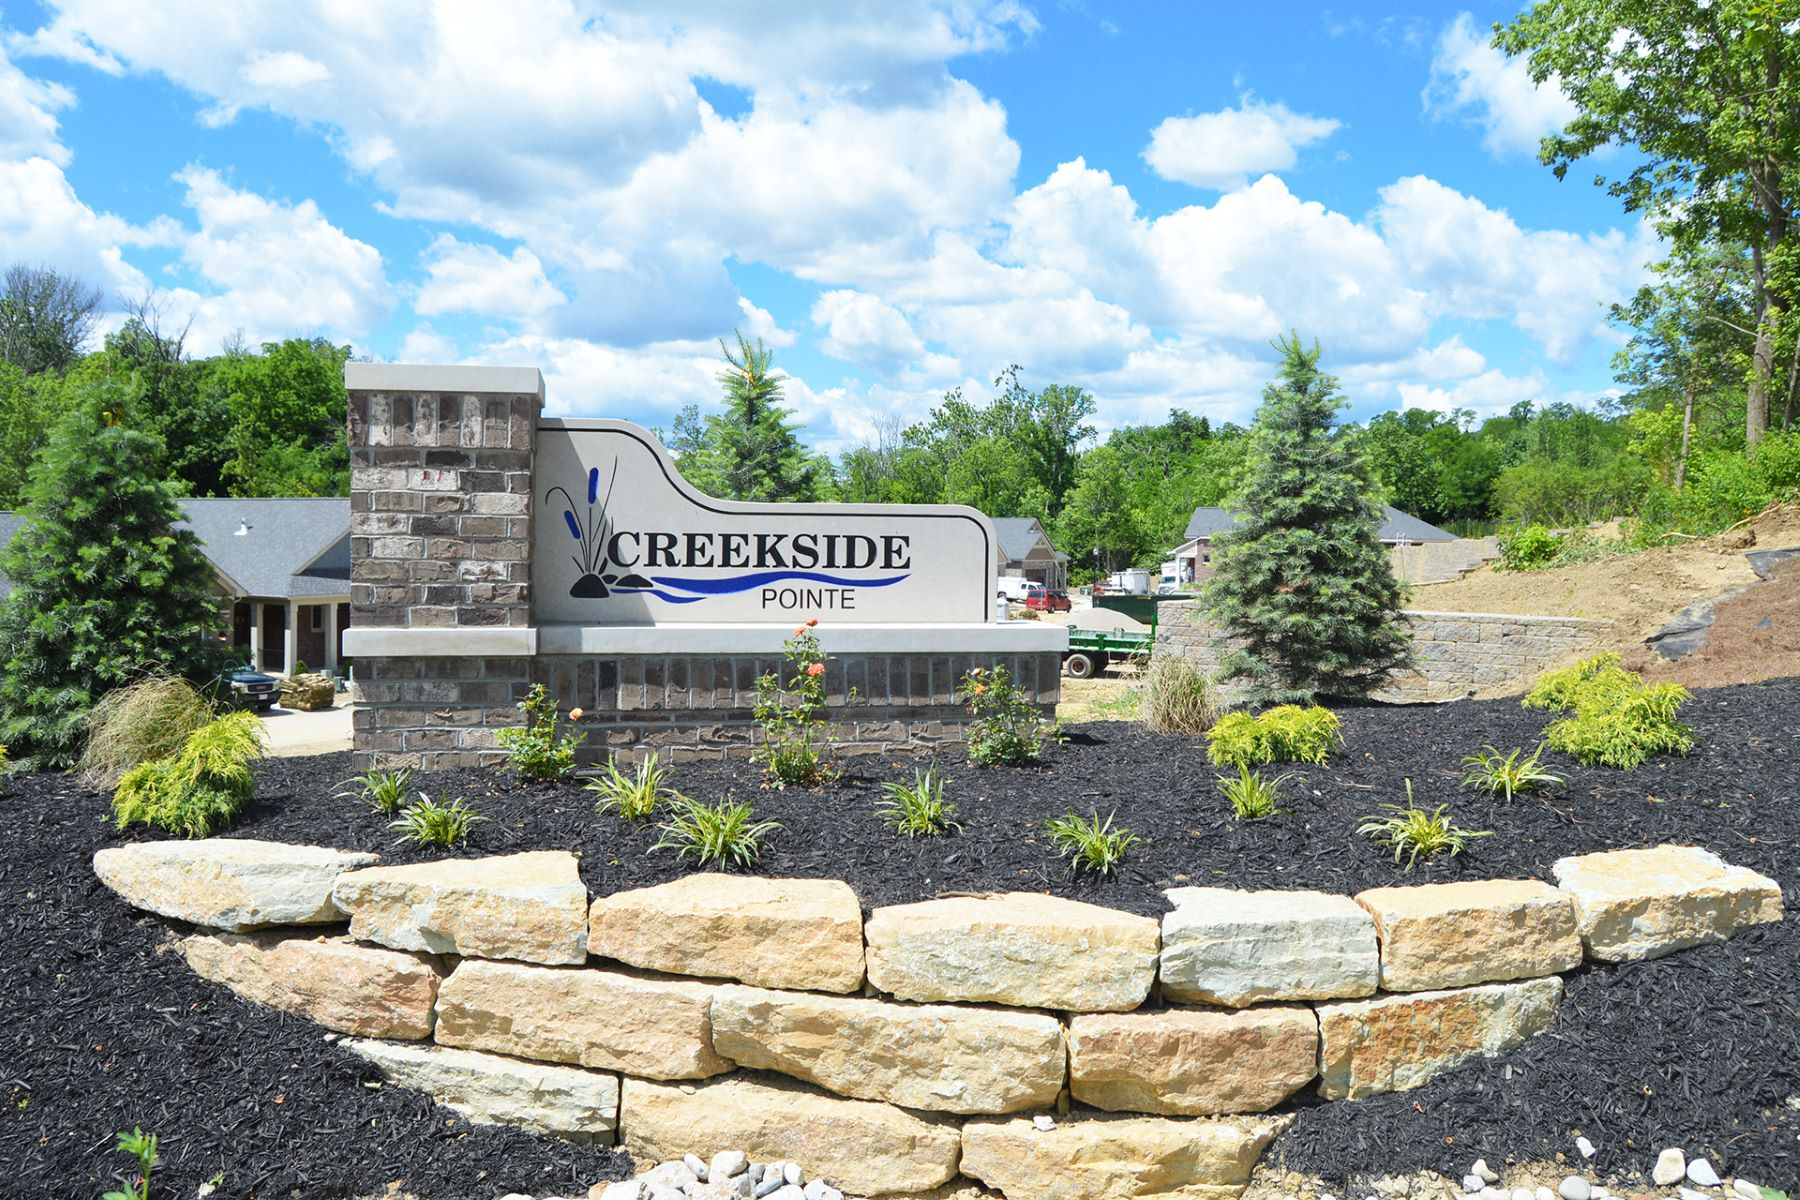 Single Family Home for Sale at Creekside Pointe 4020 Creekside Pointe 9415 Plainfield Rd. - GPS Coordinates Blue Ash, Cincinnati, Ohio, 45236 United States